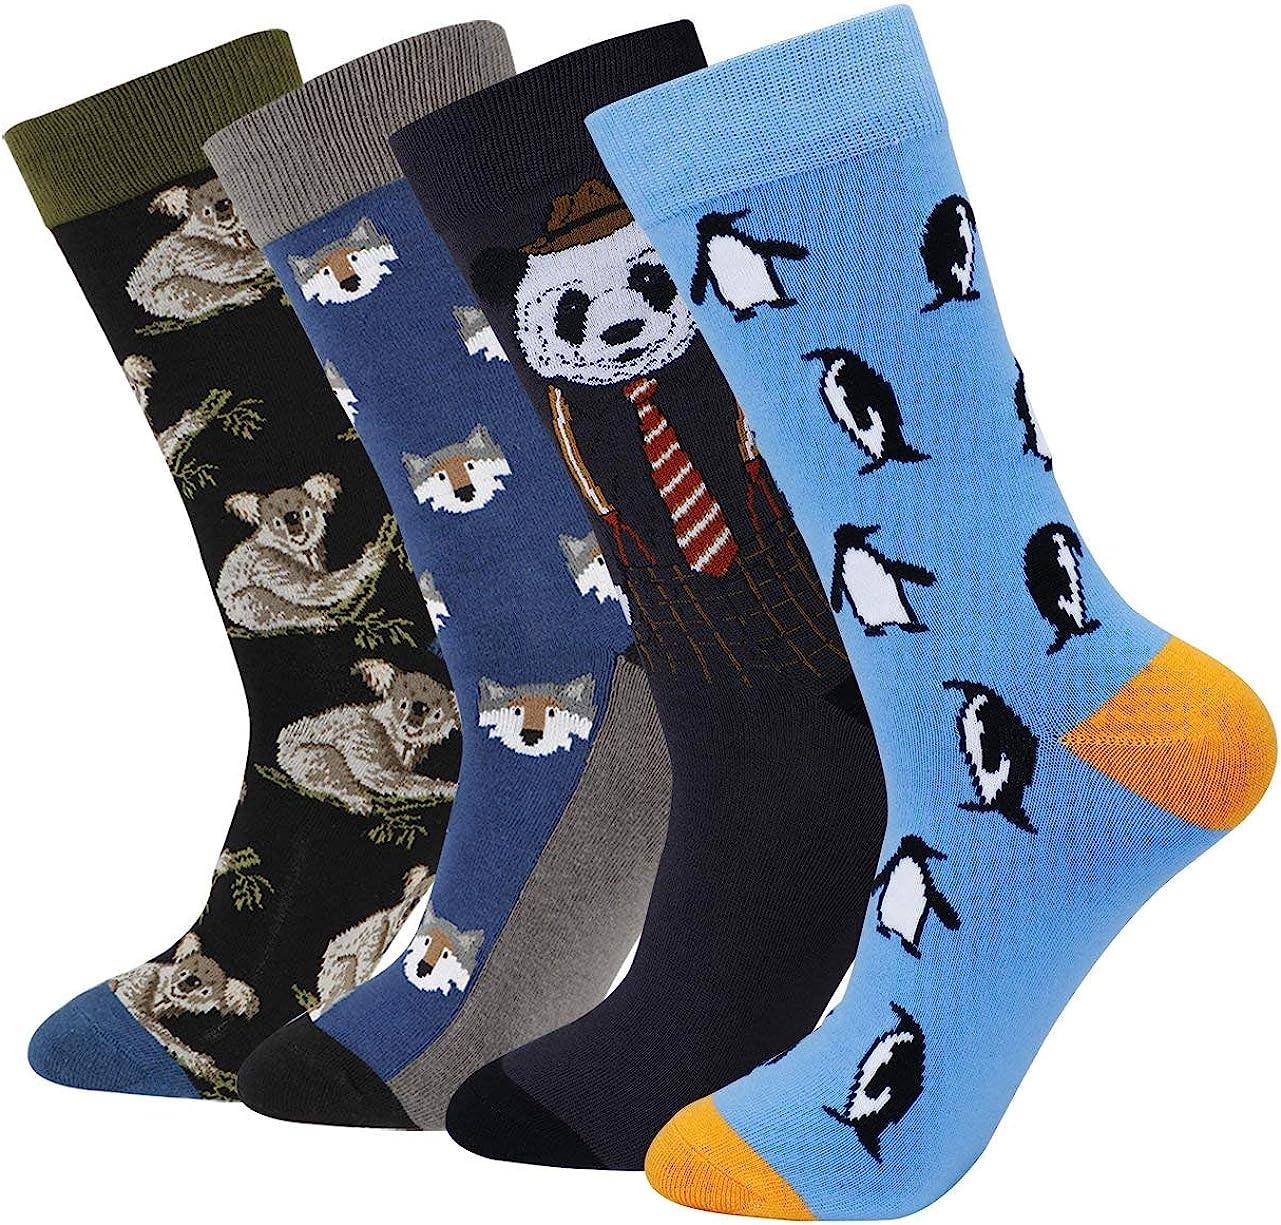 Men's Fun Funky Casual Colorful Animal Pattern Long Dress Crew Socks